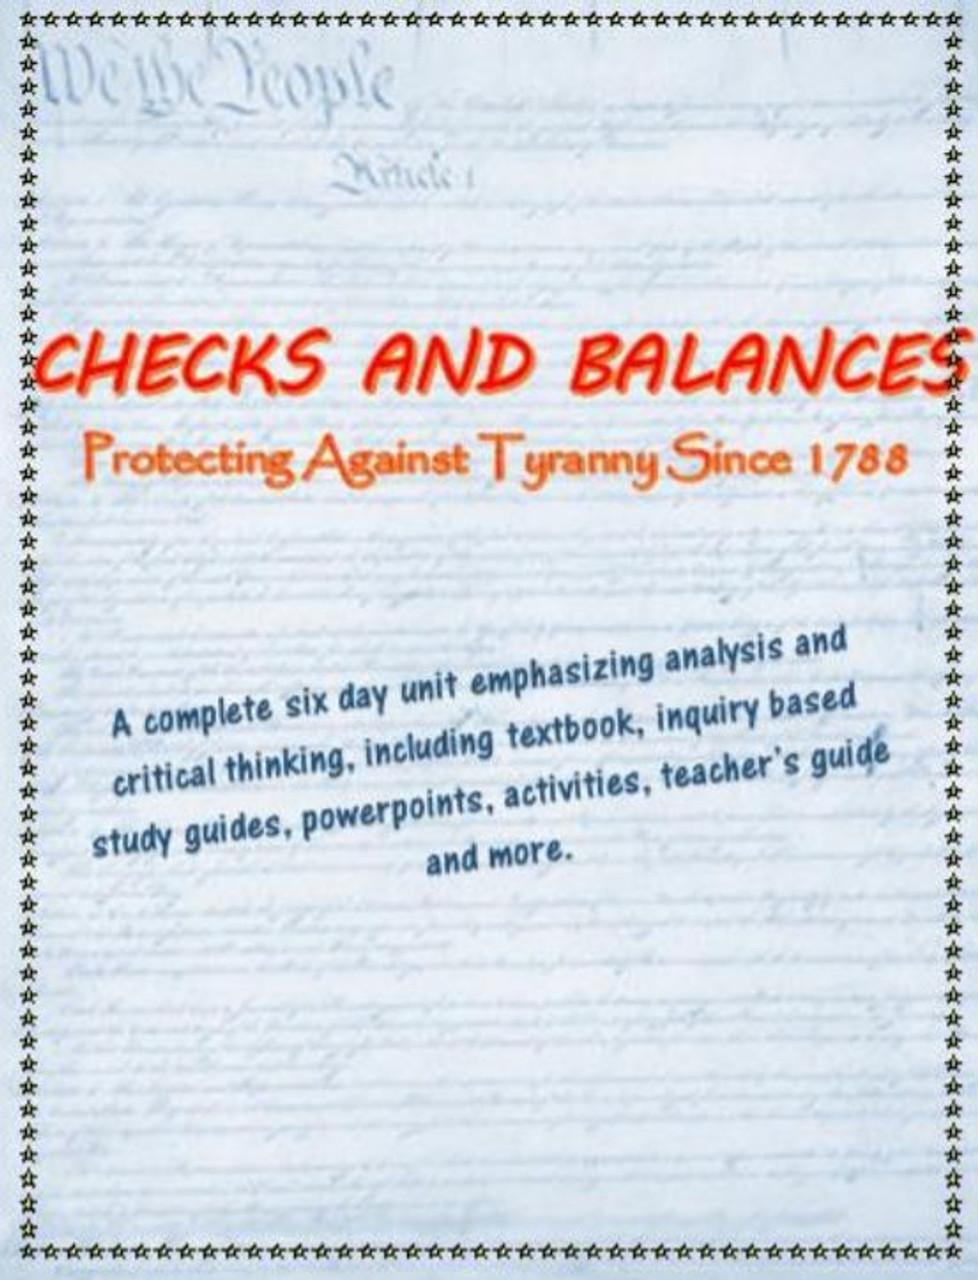 Checks and Balances complete unit, including text